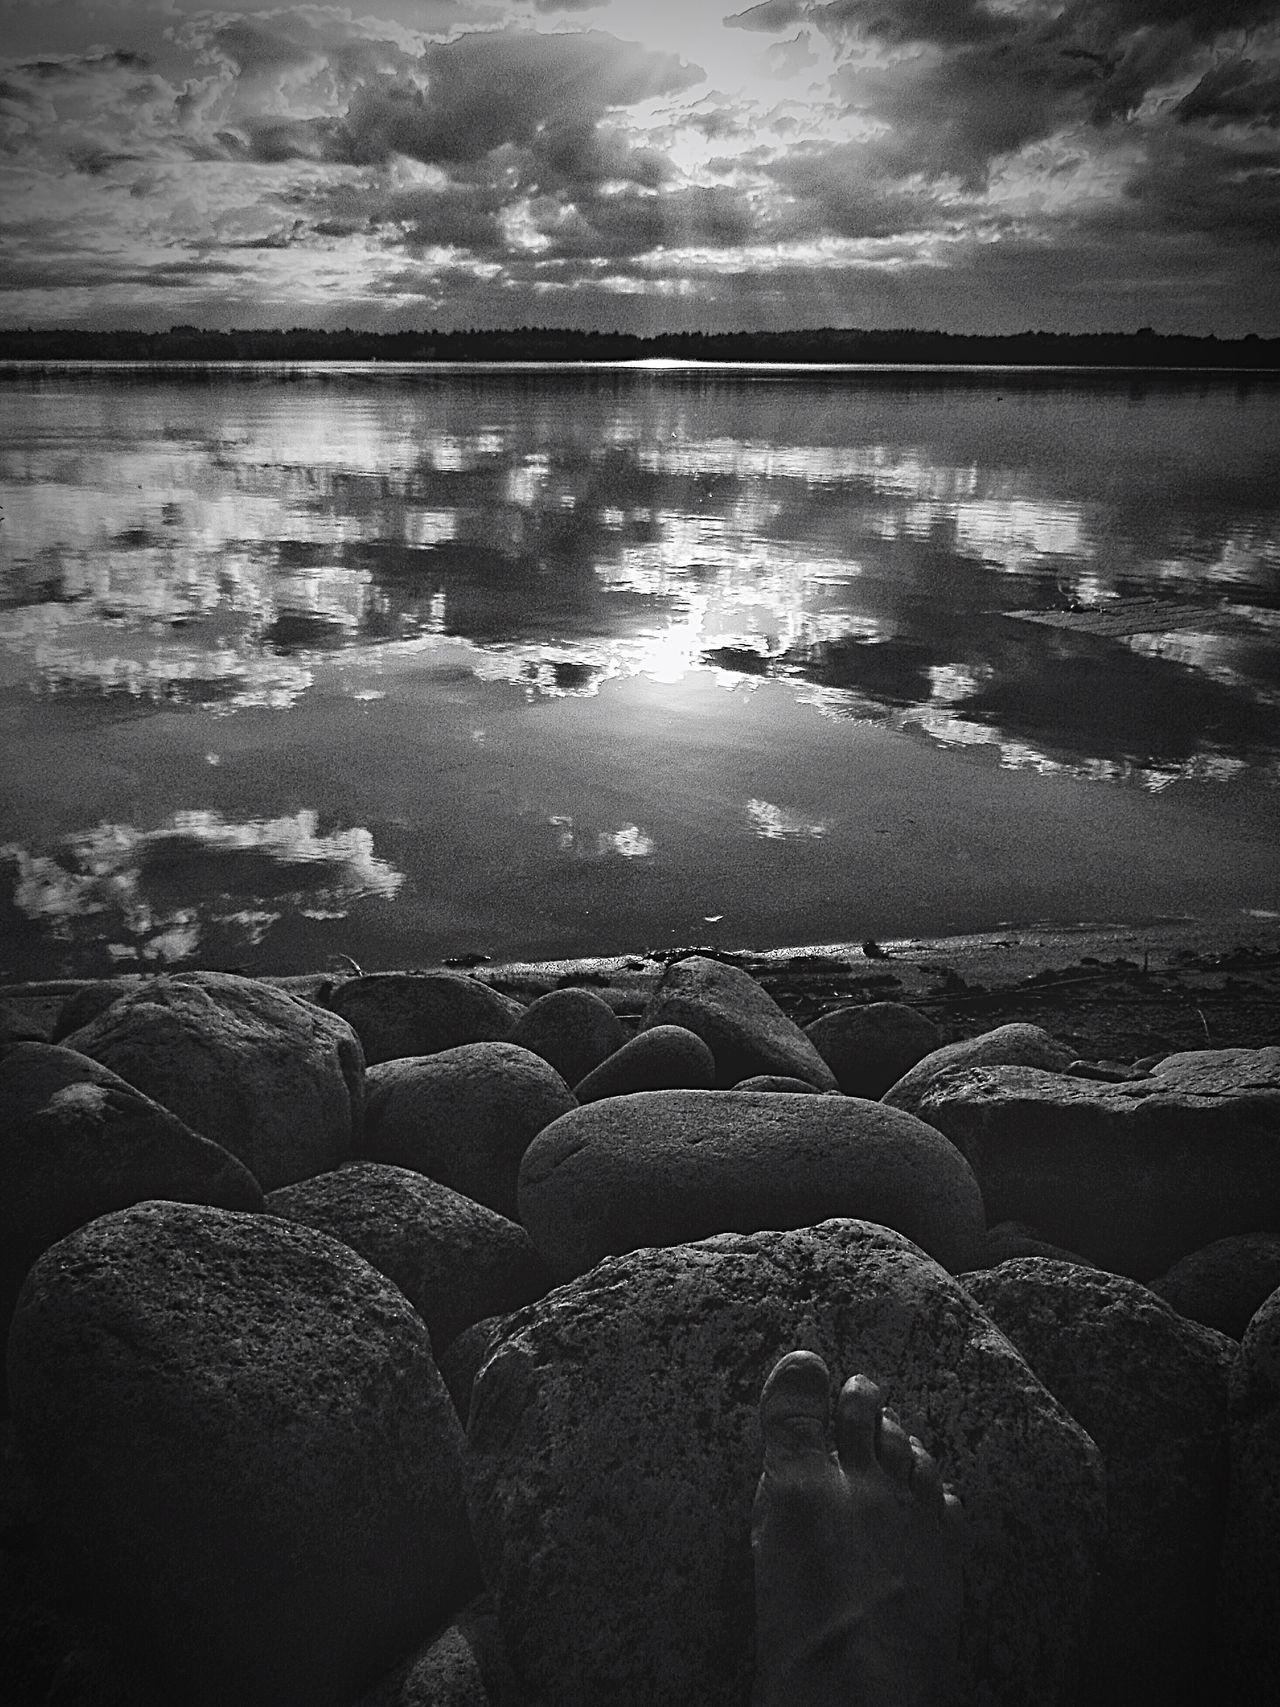 Blackandwhite Photography Blackandwhite Foot Lake Bemidji Rocks And Water LakeReflection POV